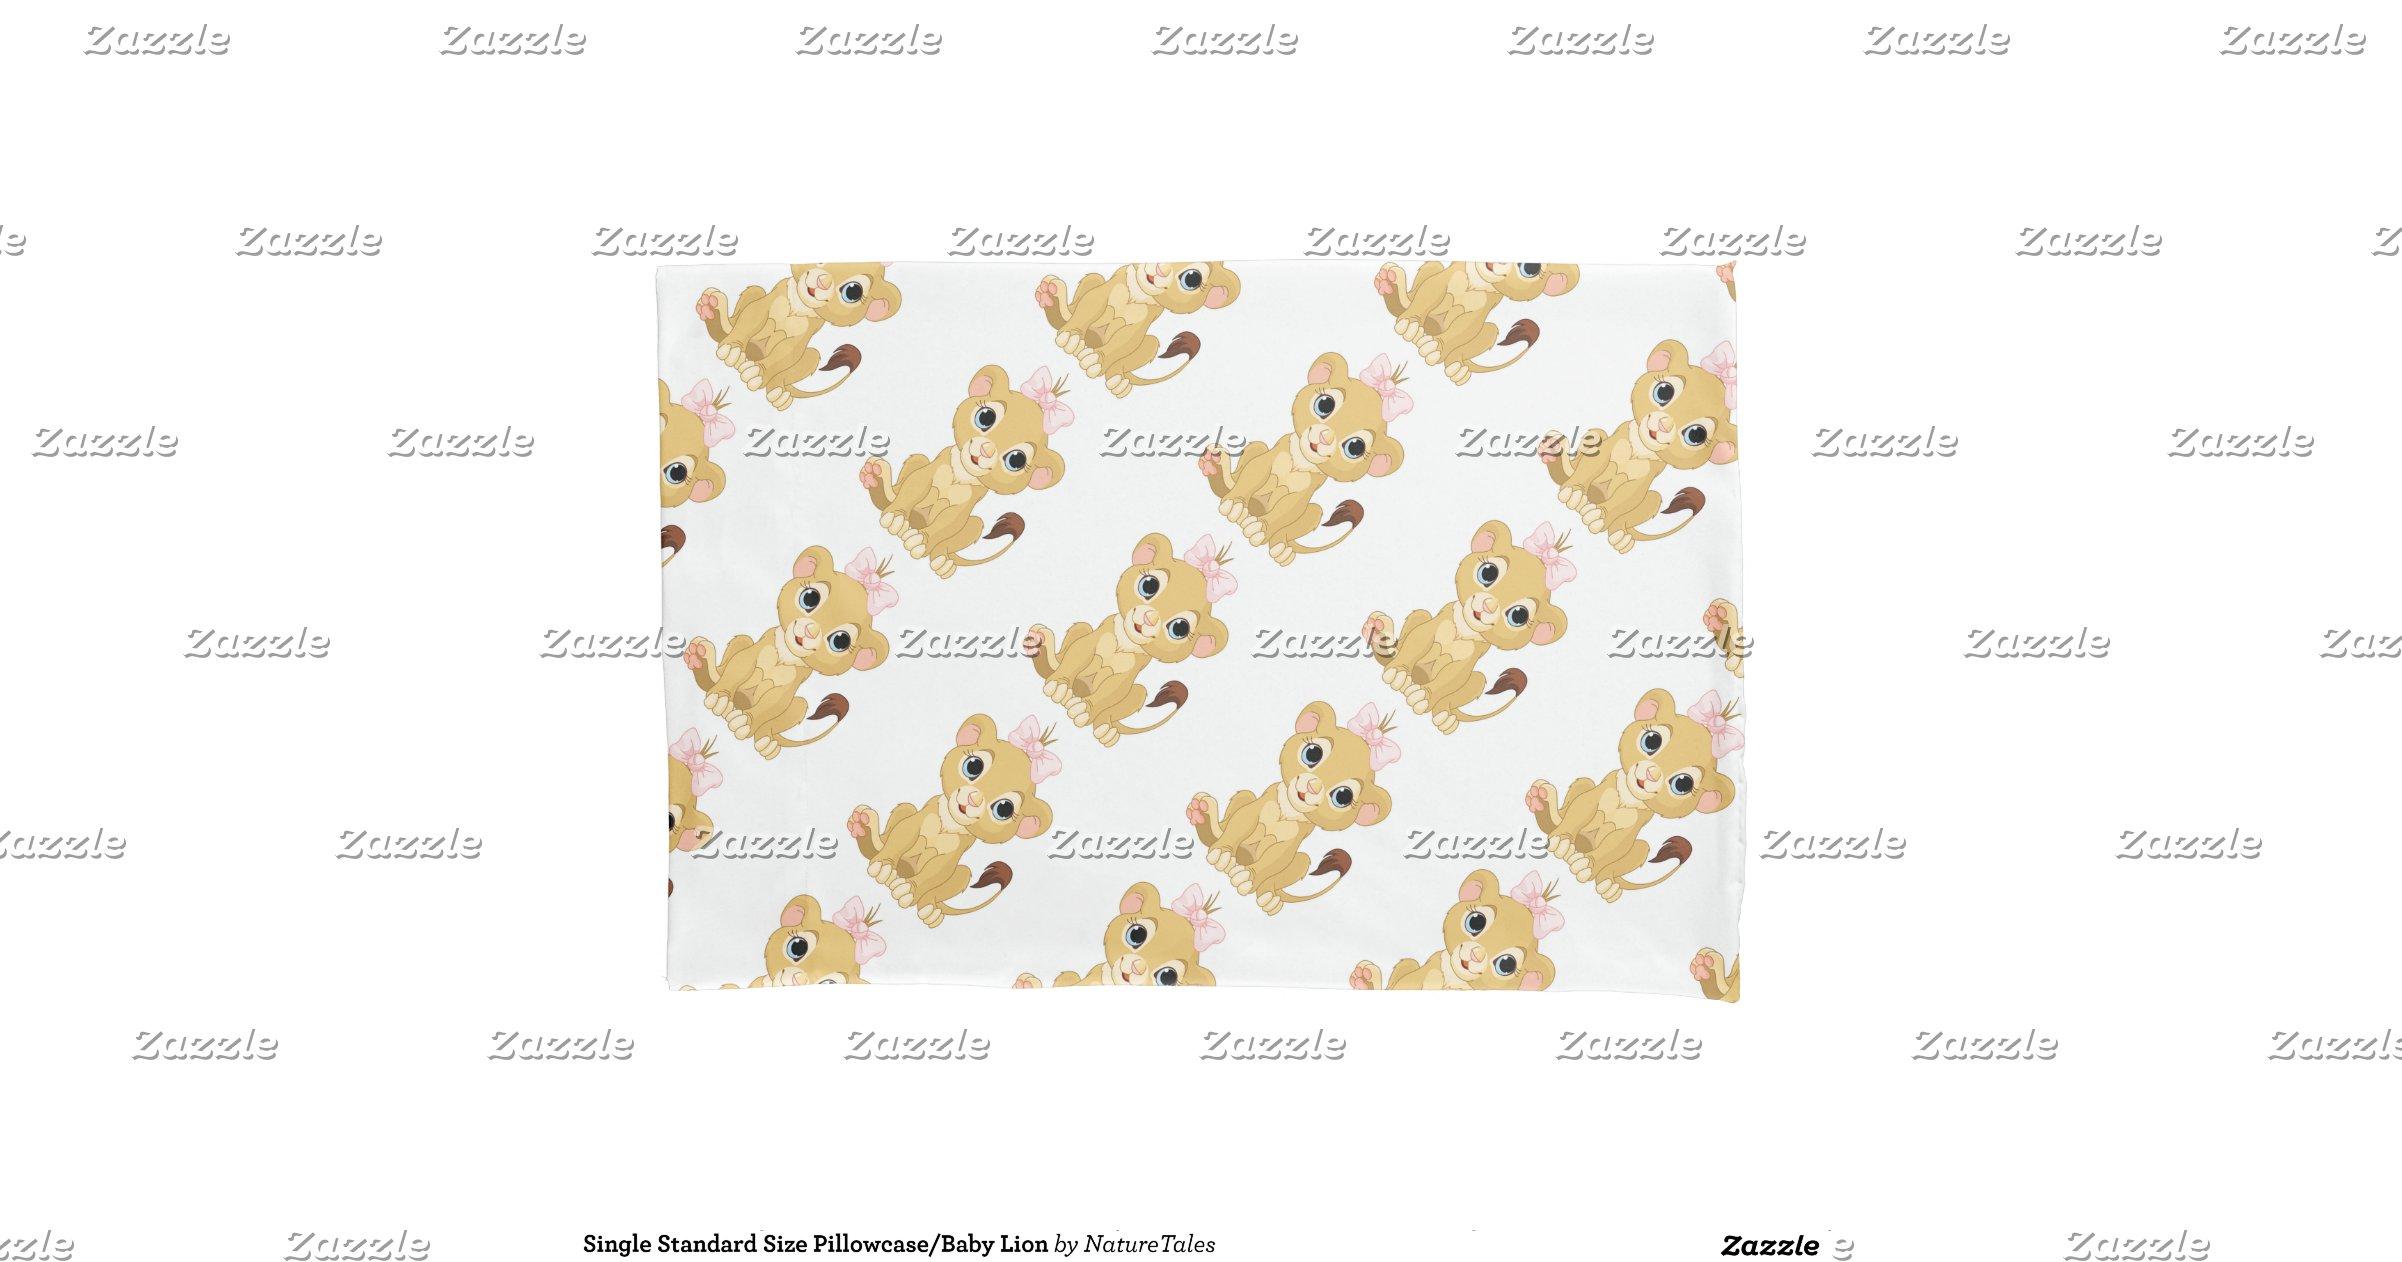 single standard size pillowcase baby lion pillowcase zazzle. Black Bedroom Furniture Sets. Home Design Ideas